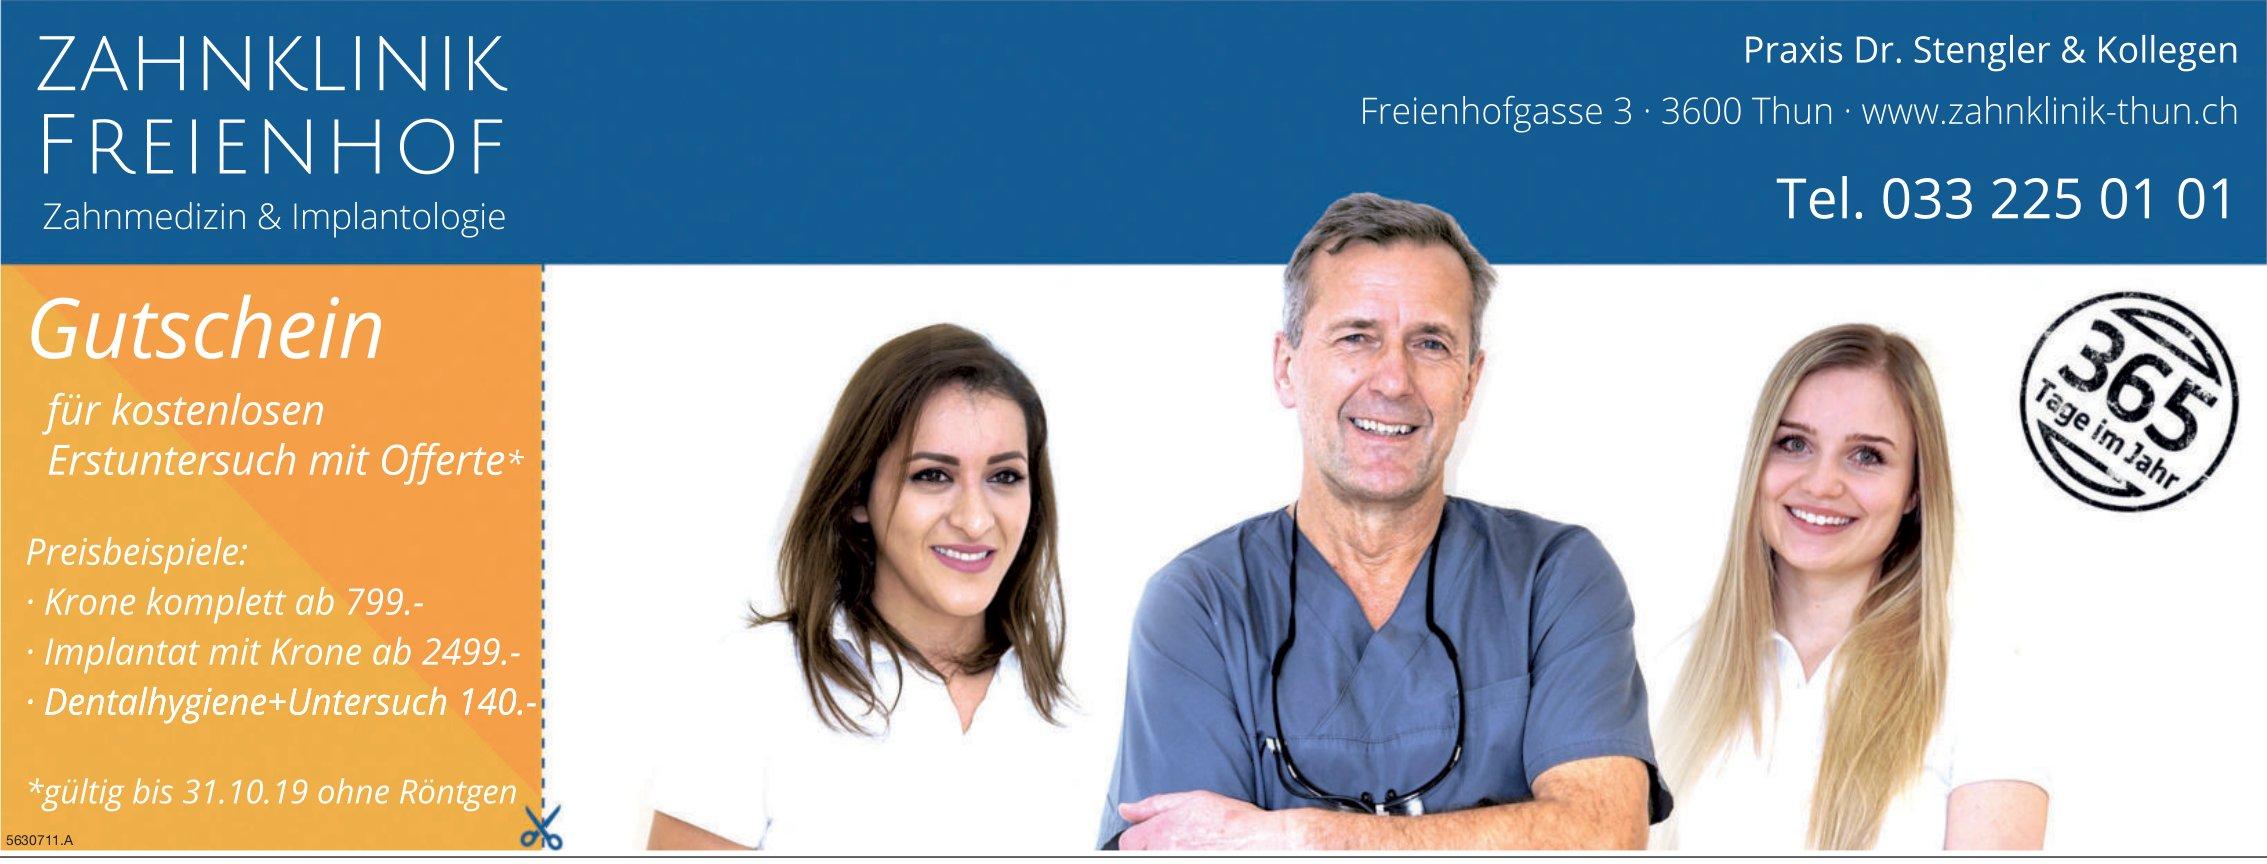 ZAHNKLINIK FREIENHOF, Thun - Praxis Dr. Stengler & Kollegen